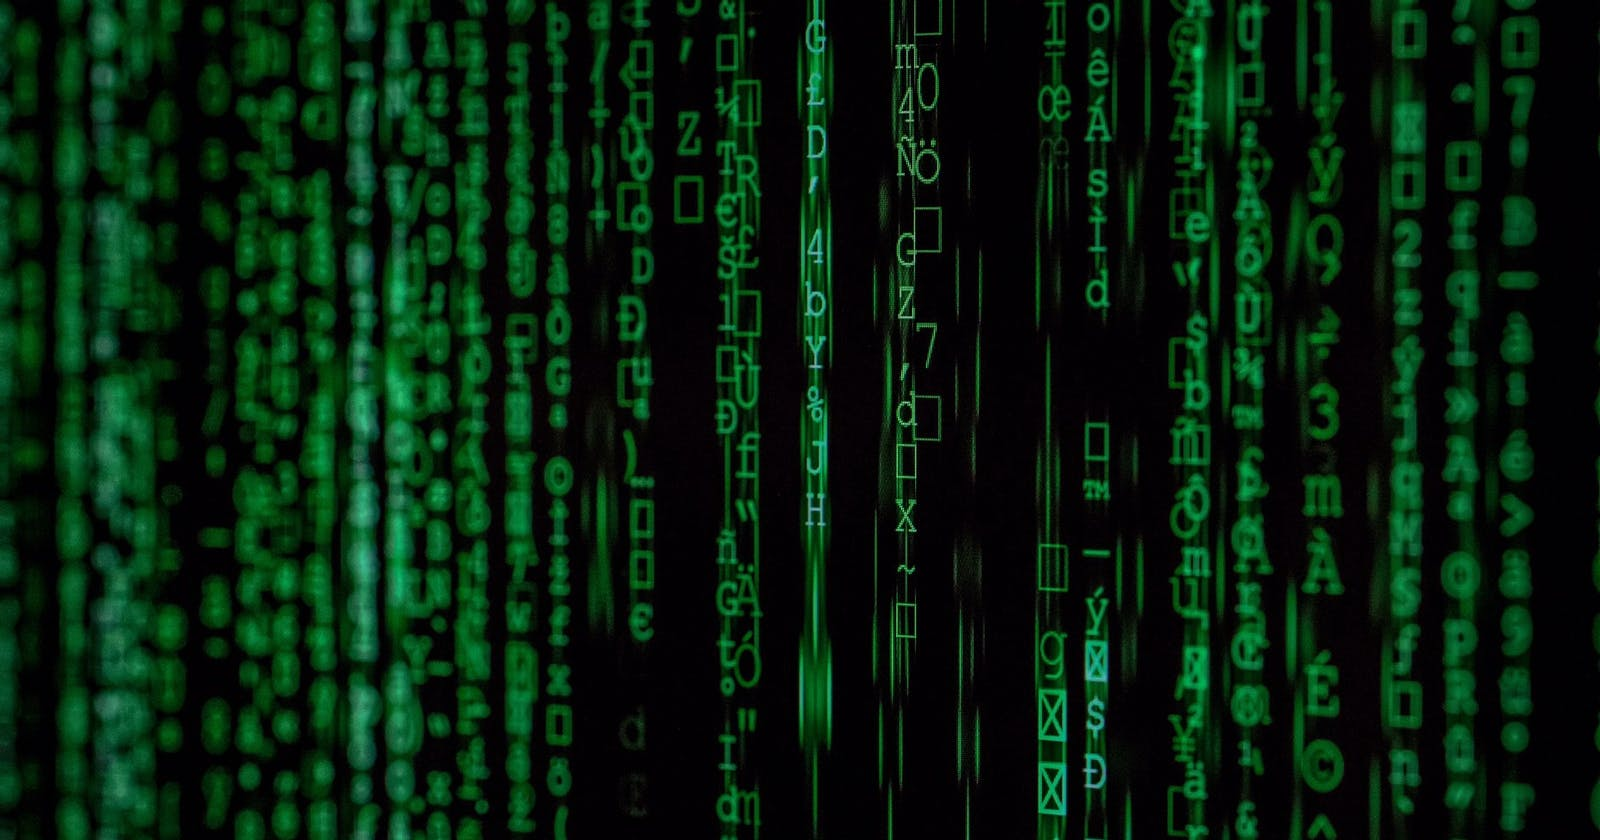 Internet 2.0 — The New Internet